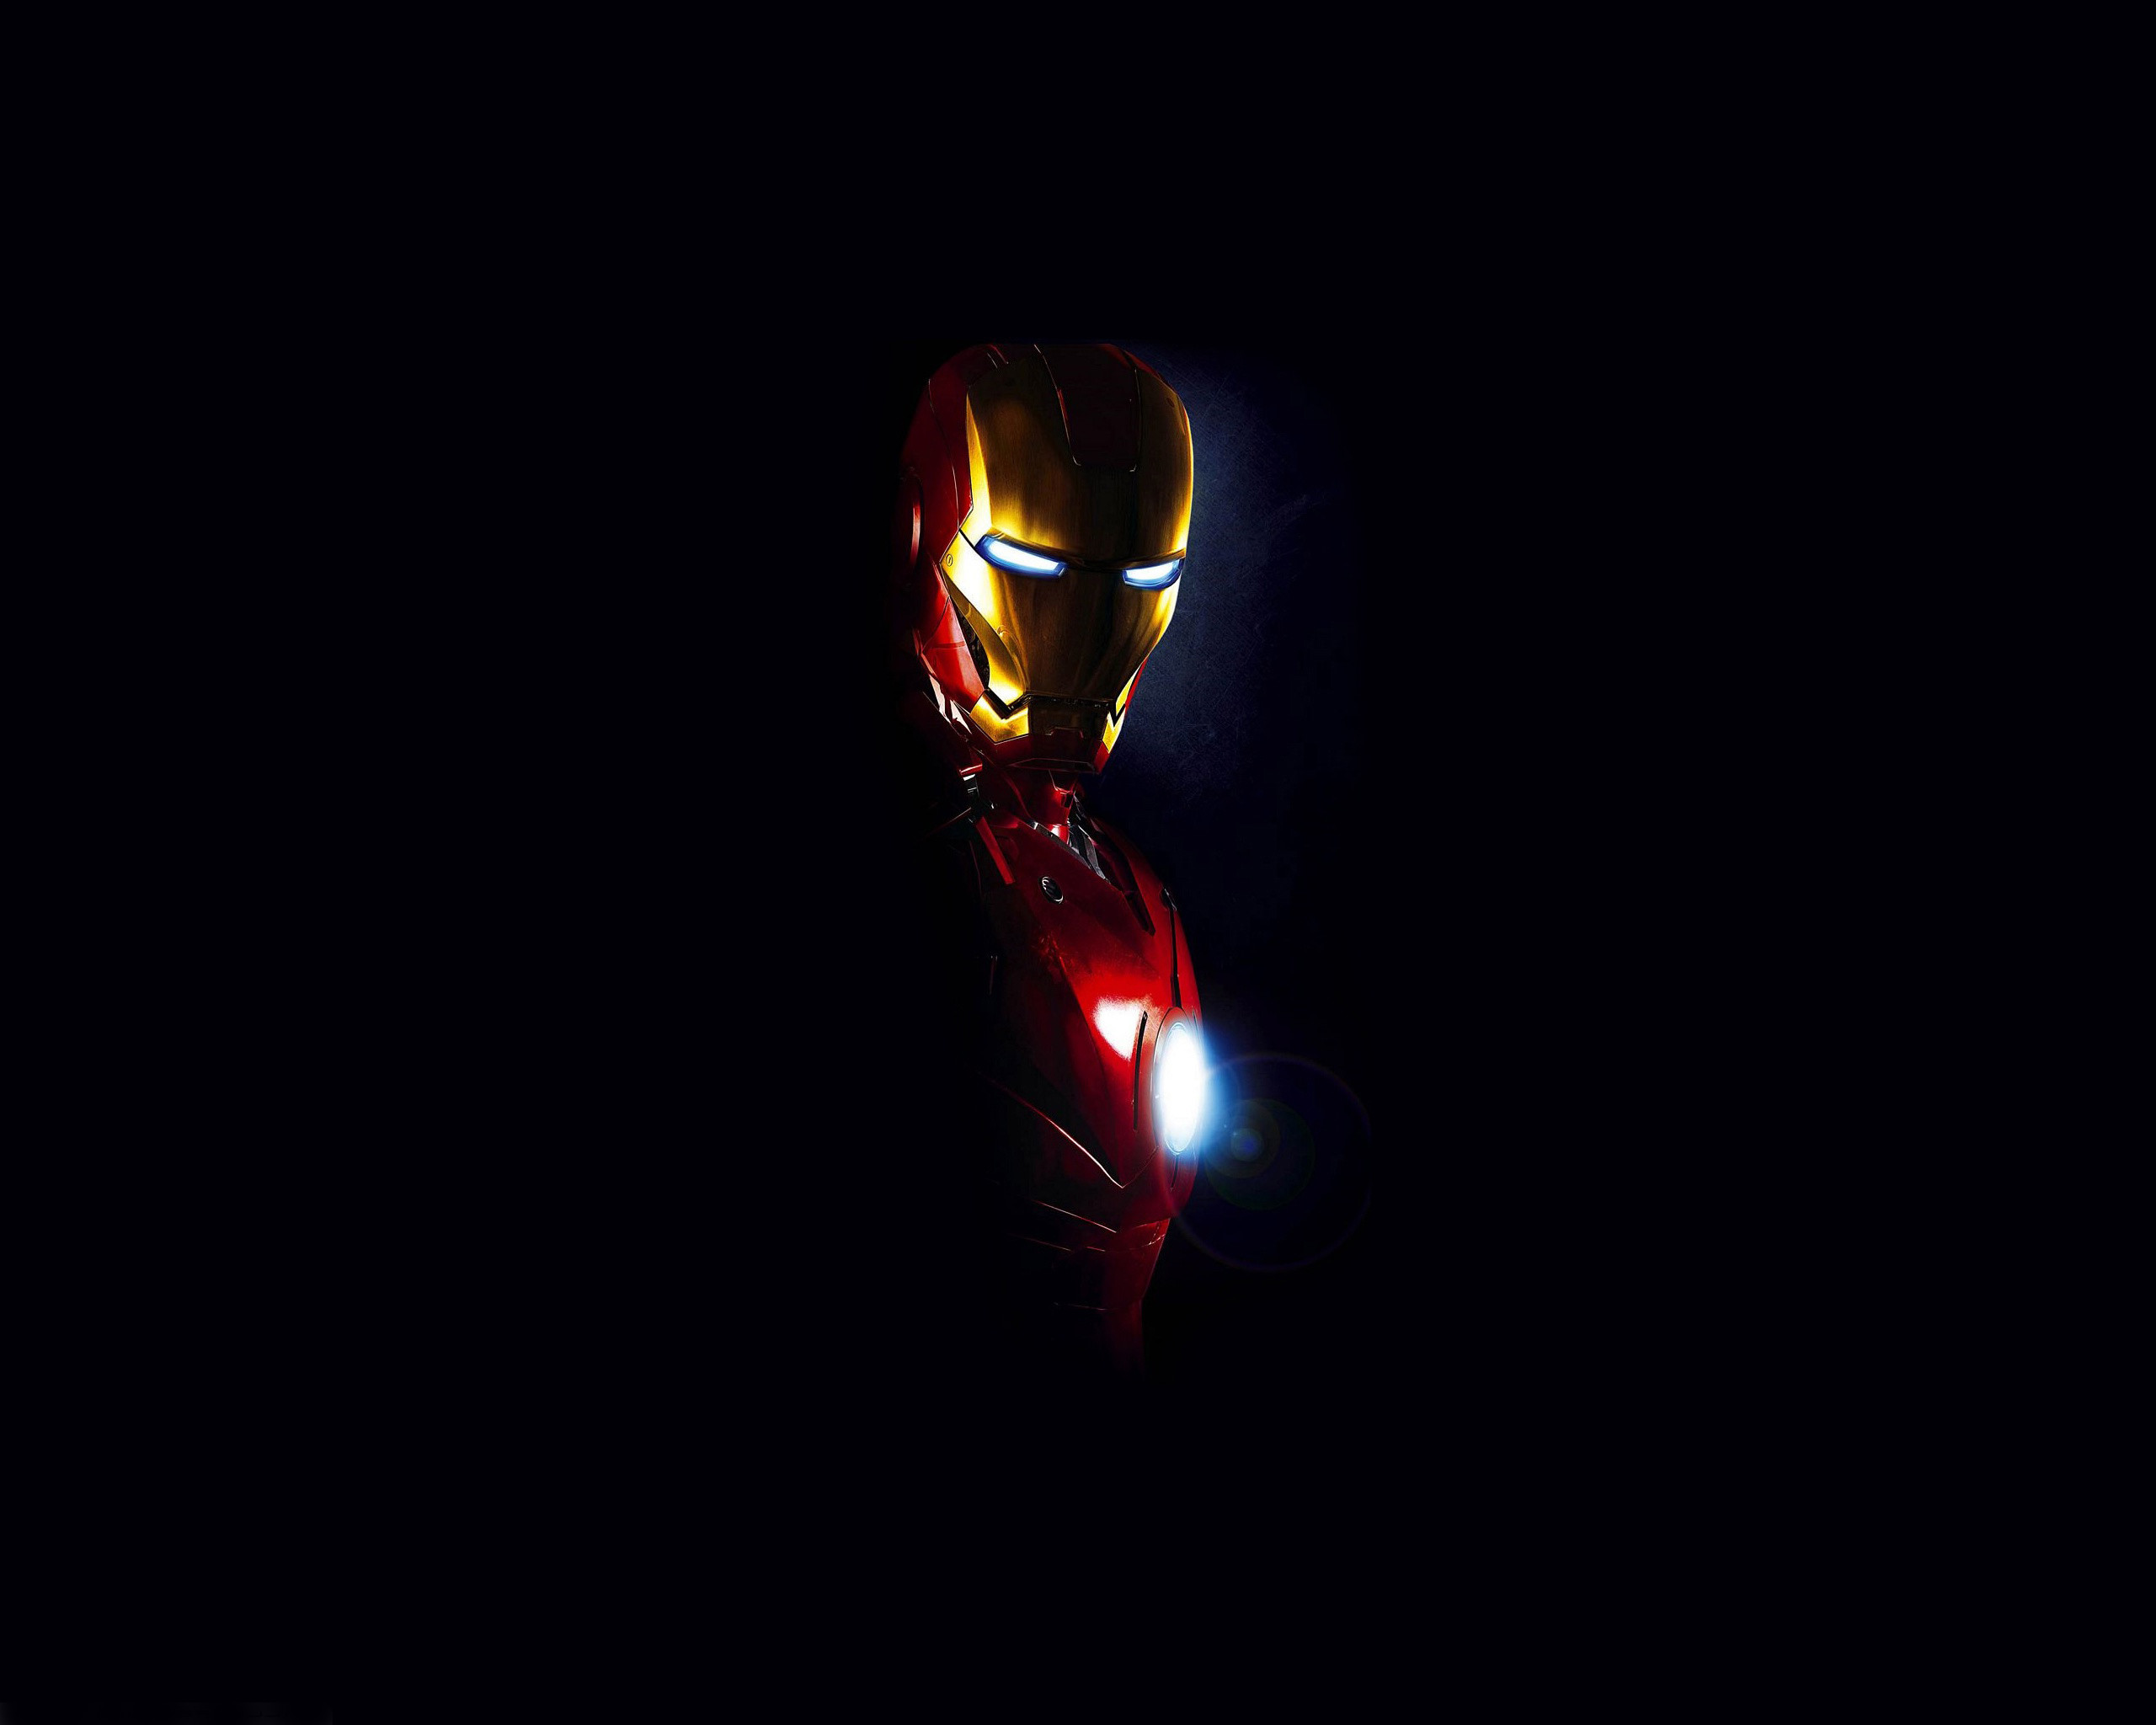 Civil War Artowork Iron Man Wallpapers HD Wallpapers | HD Wallpapers |  Pinterest | Man wallpaper, Hd wallpaper and Wallpaper